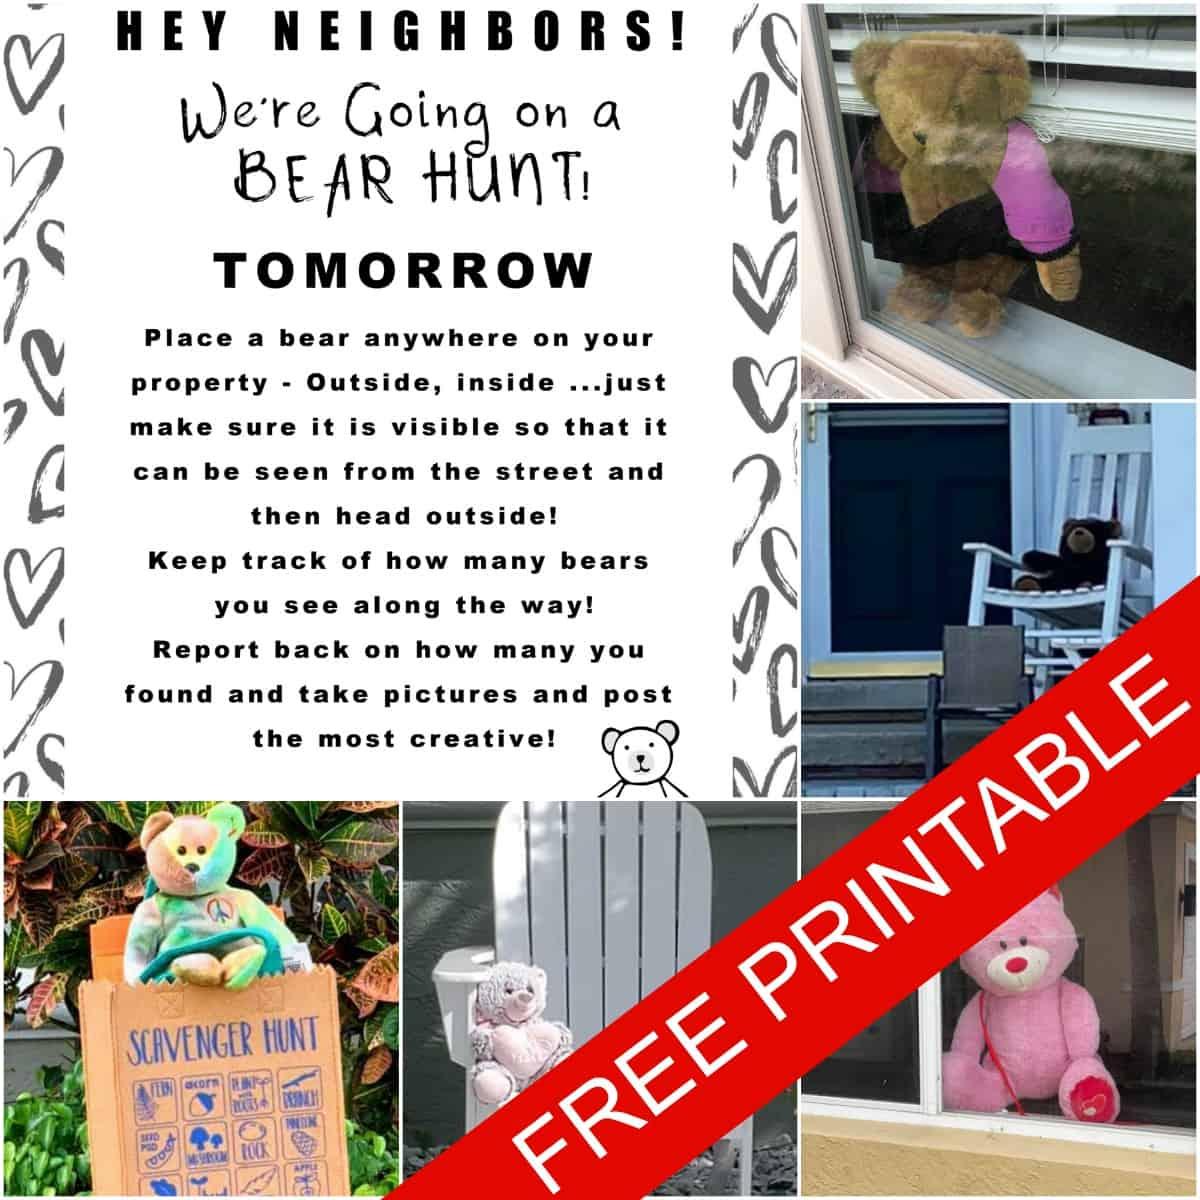 Plan a Teddy Bear Scavenger Hunt With Your Neighborhood (FREE PRINTABLE INVITE!)